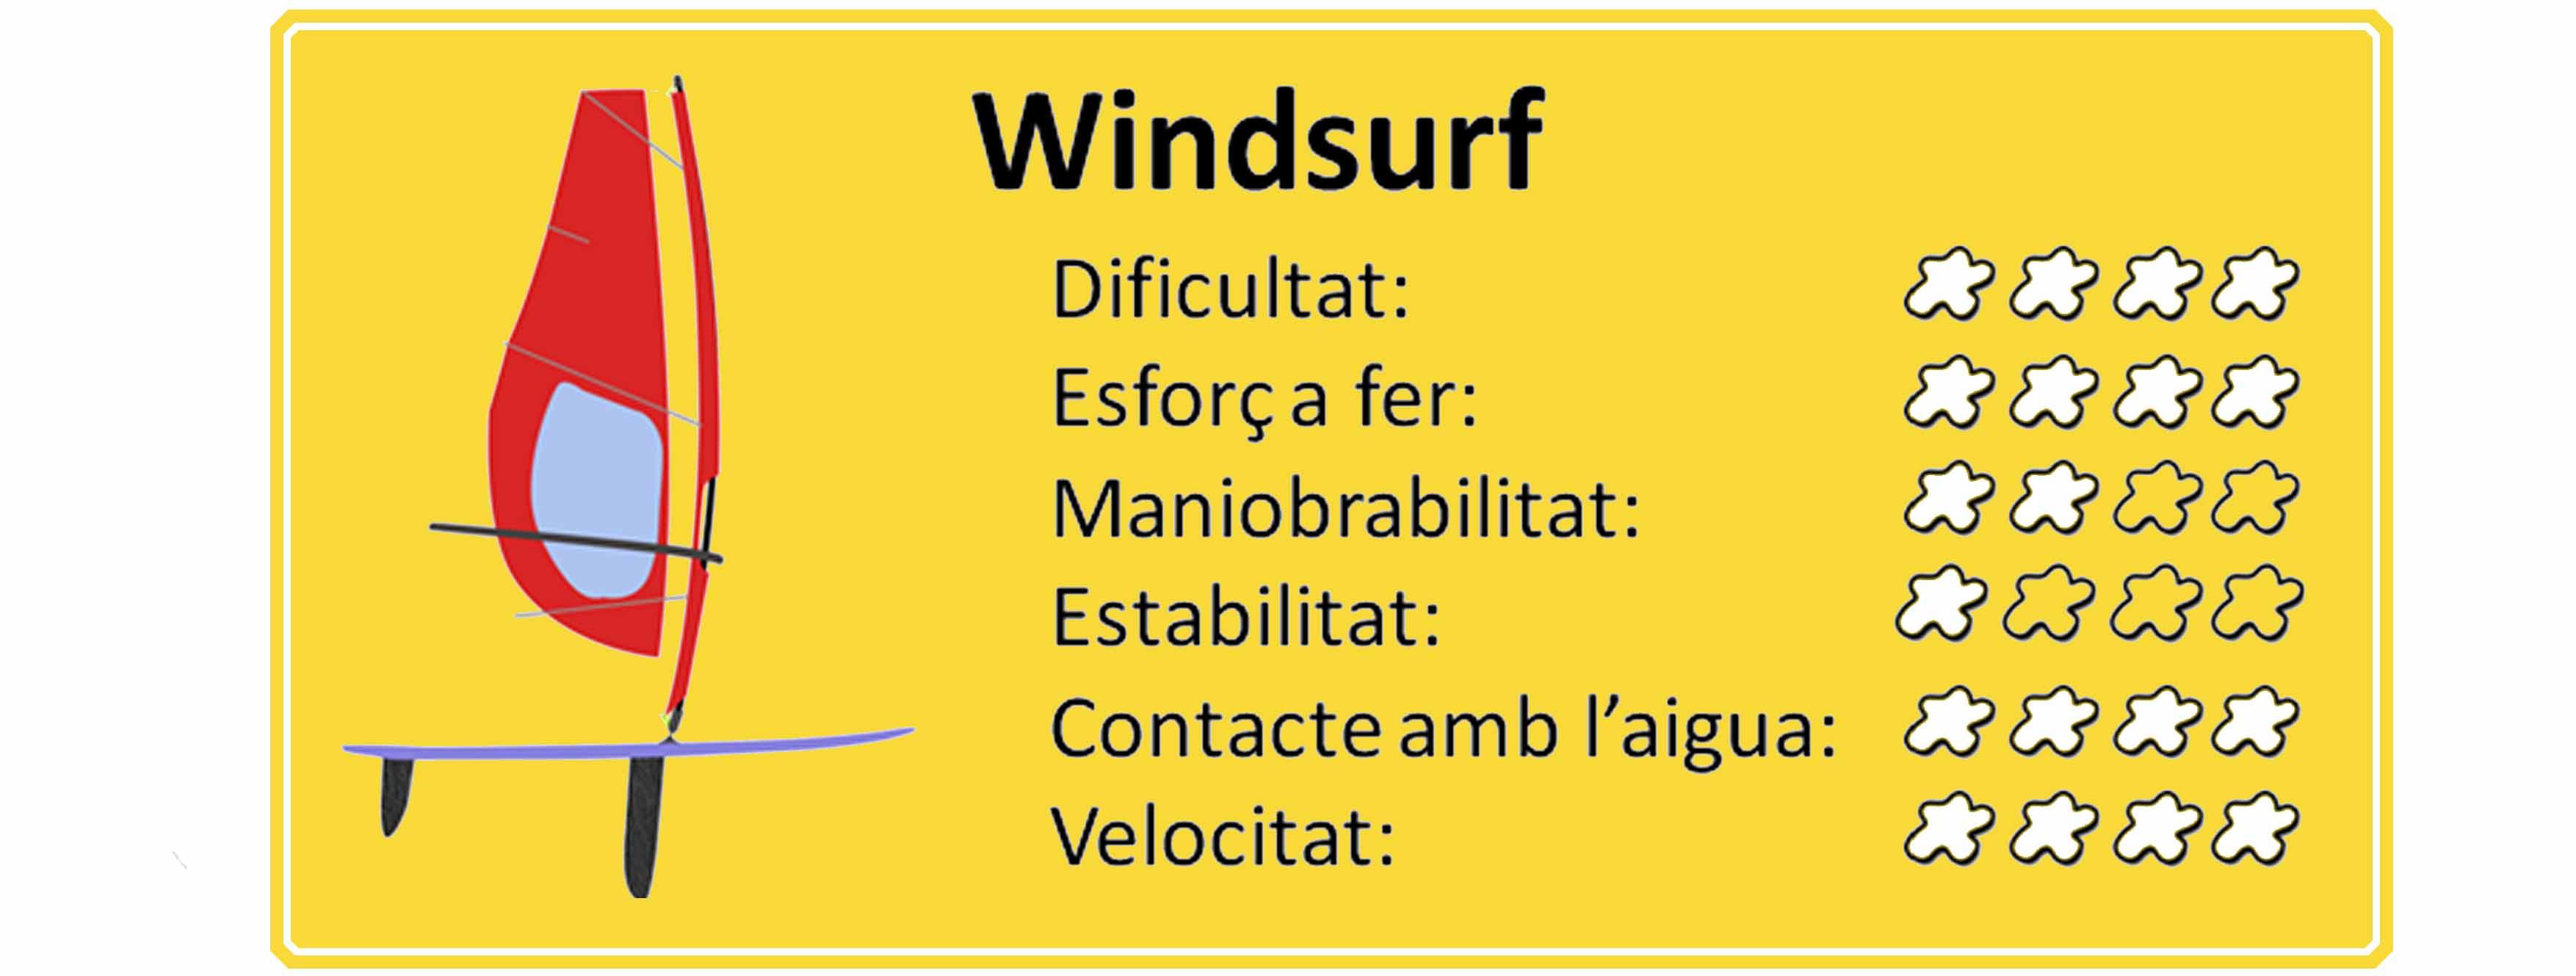 prestacions windsurf